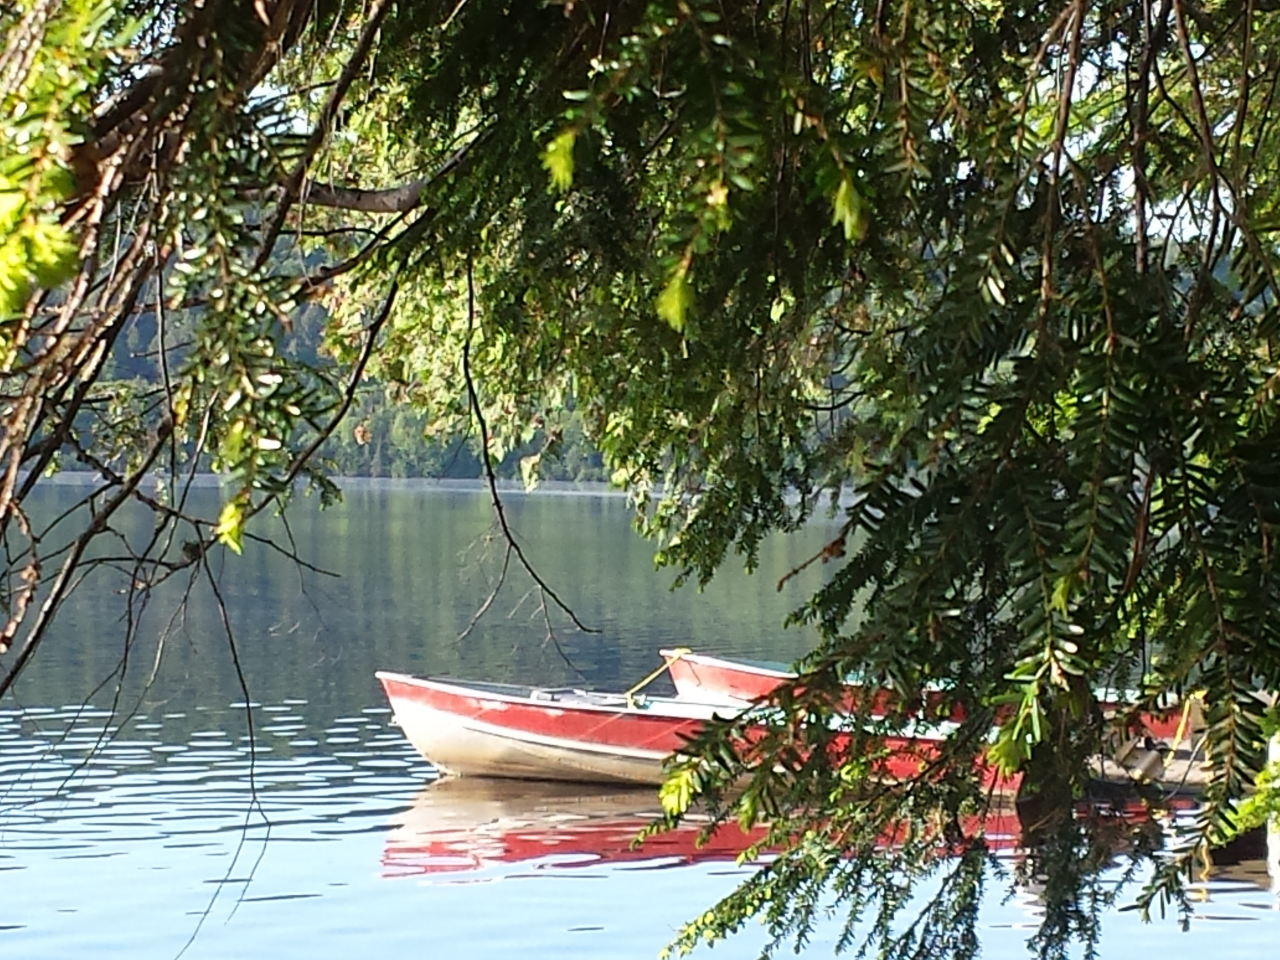 Algonquin Park - Canoe